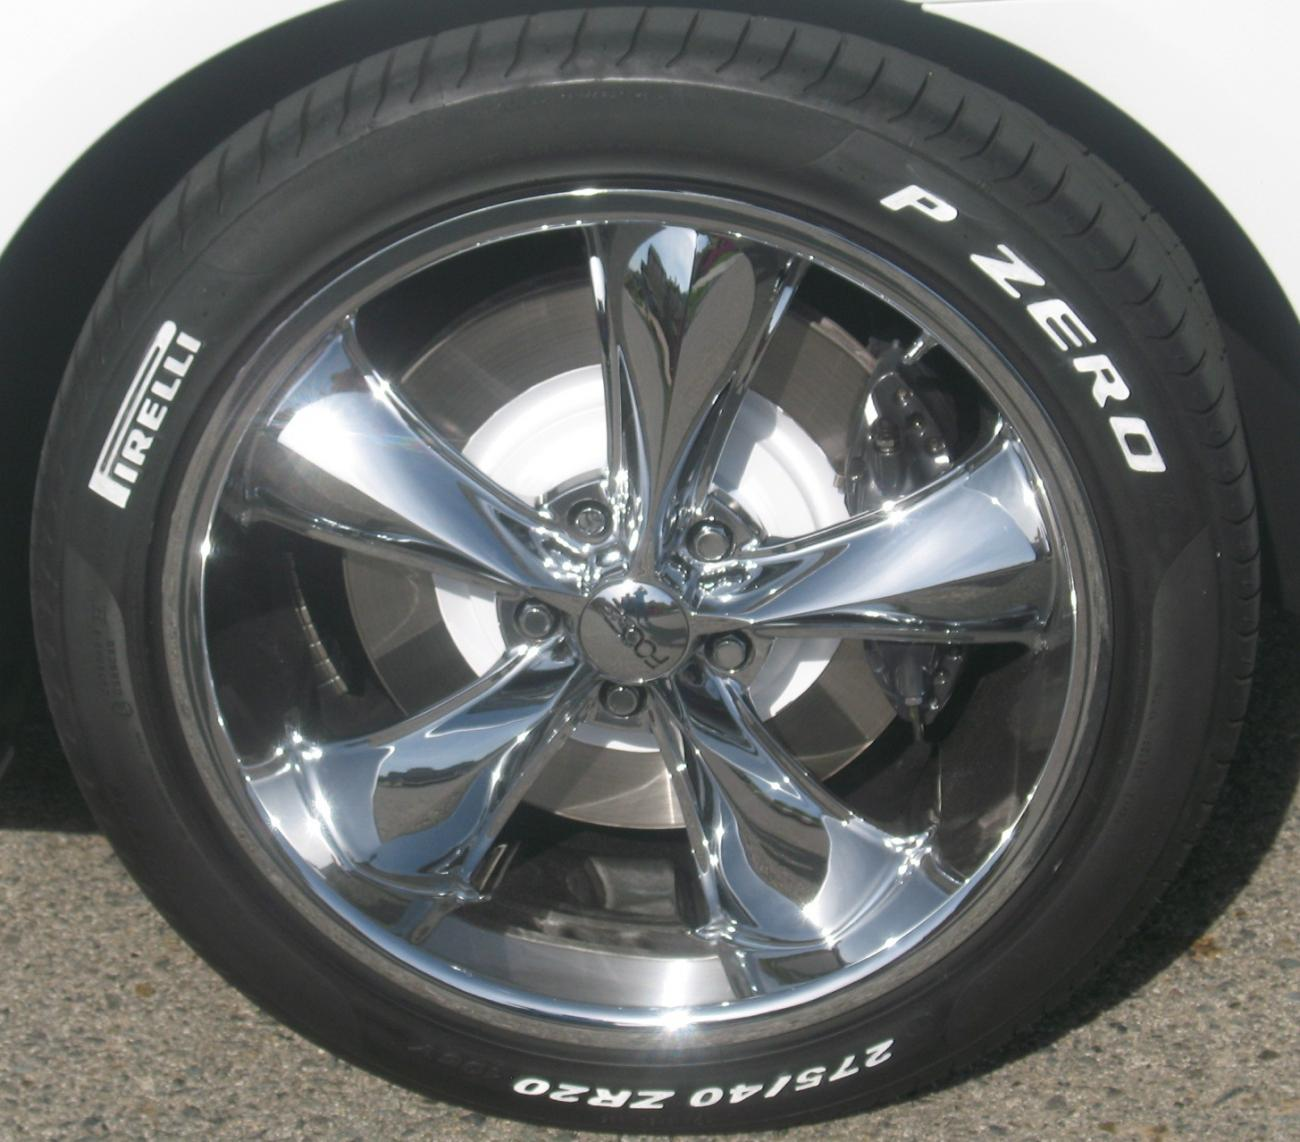 White Raised Lettered Tires Camaro5 Chevy Camaro Forum